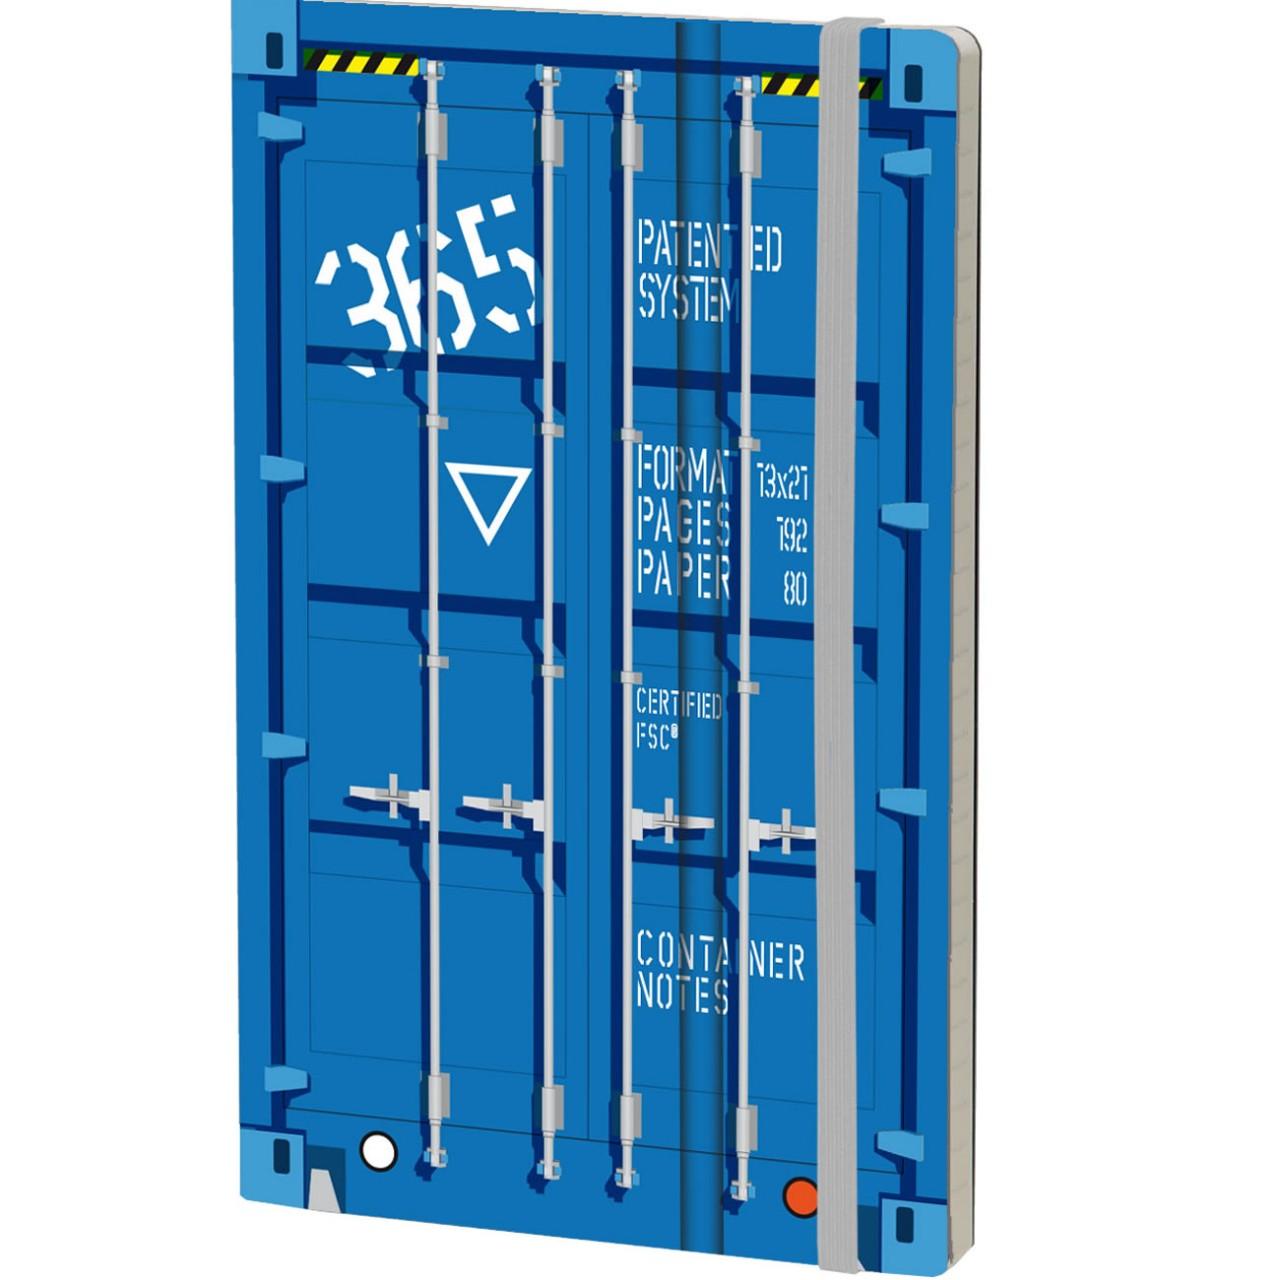 Stifflex Notizbuch CONTAINER NOTES 13 x 21 cm 192 S., BLUE